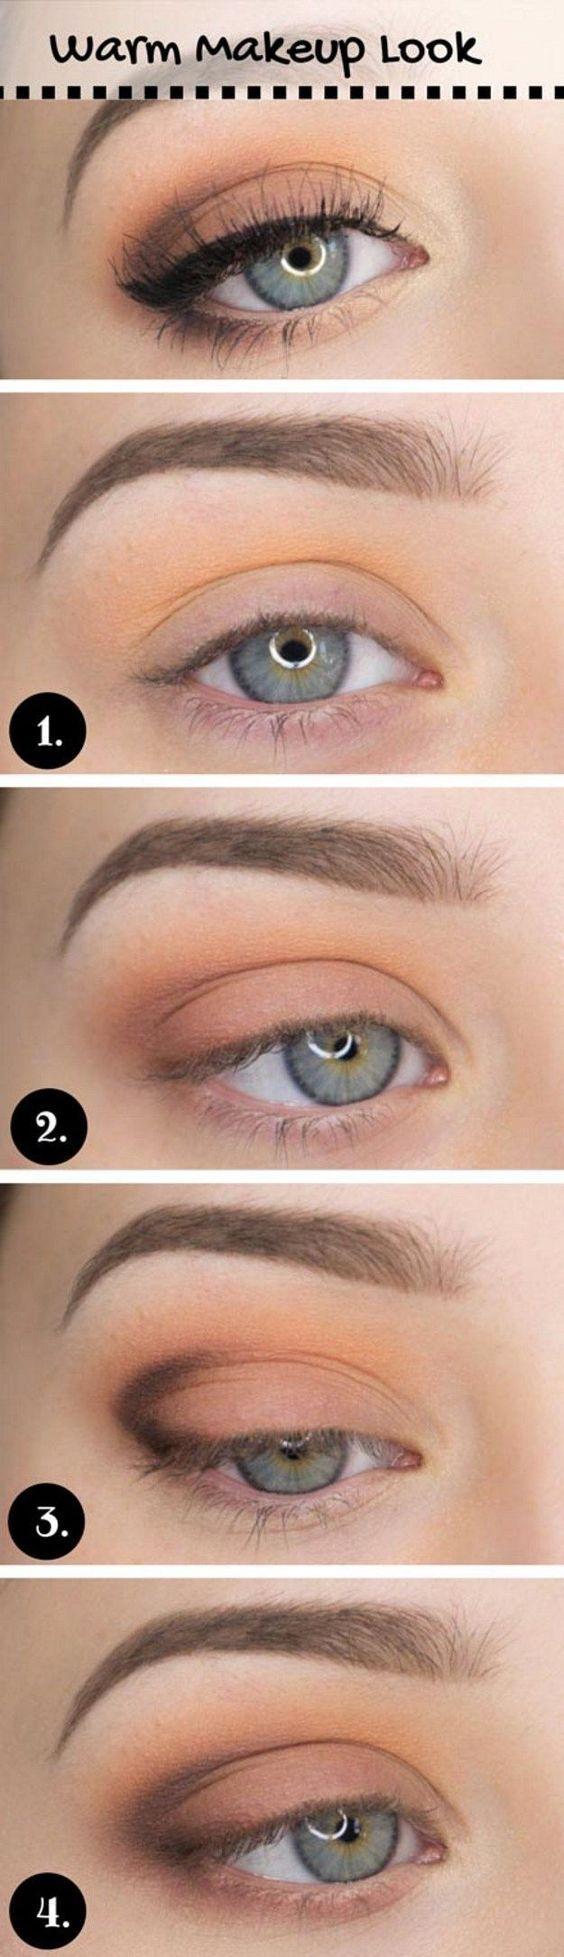 1730 best makeup tutorials images on pinterest maquiagem beauty how to do casual makeup look everyday makeup by makeup tutorials at http baditri Choice Image